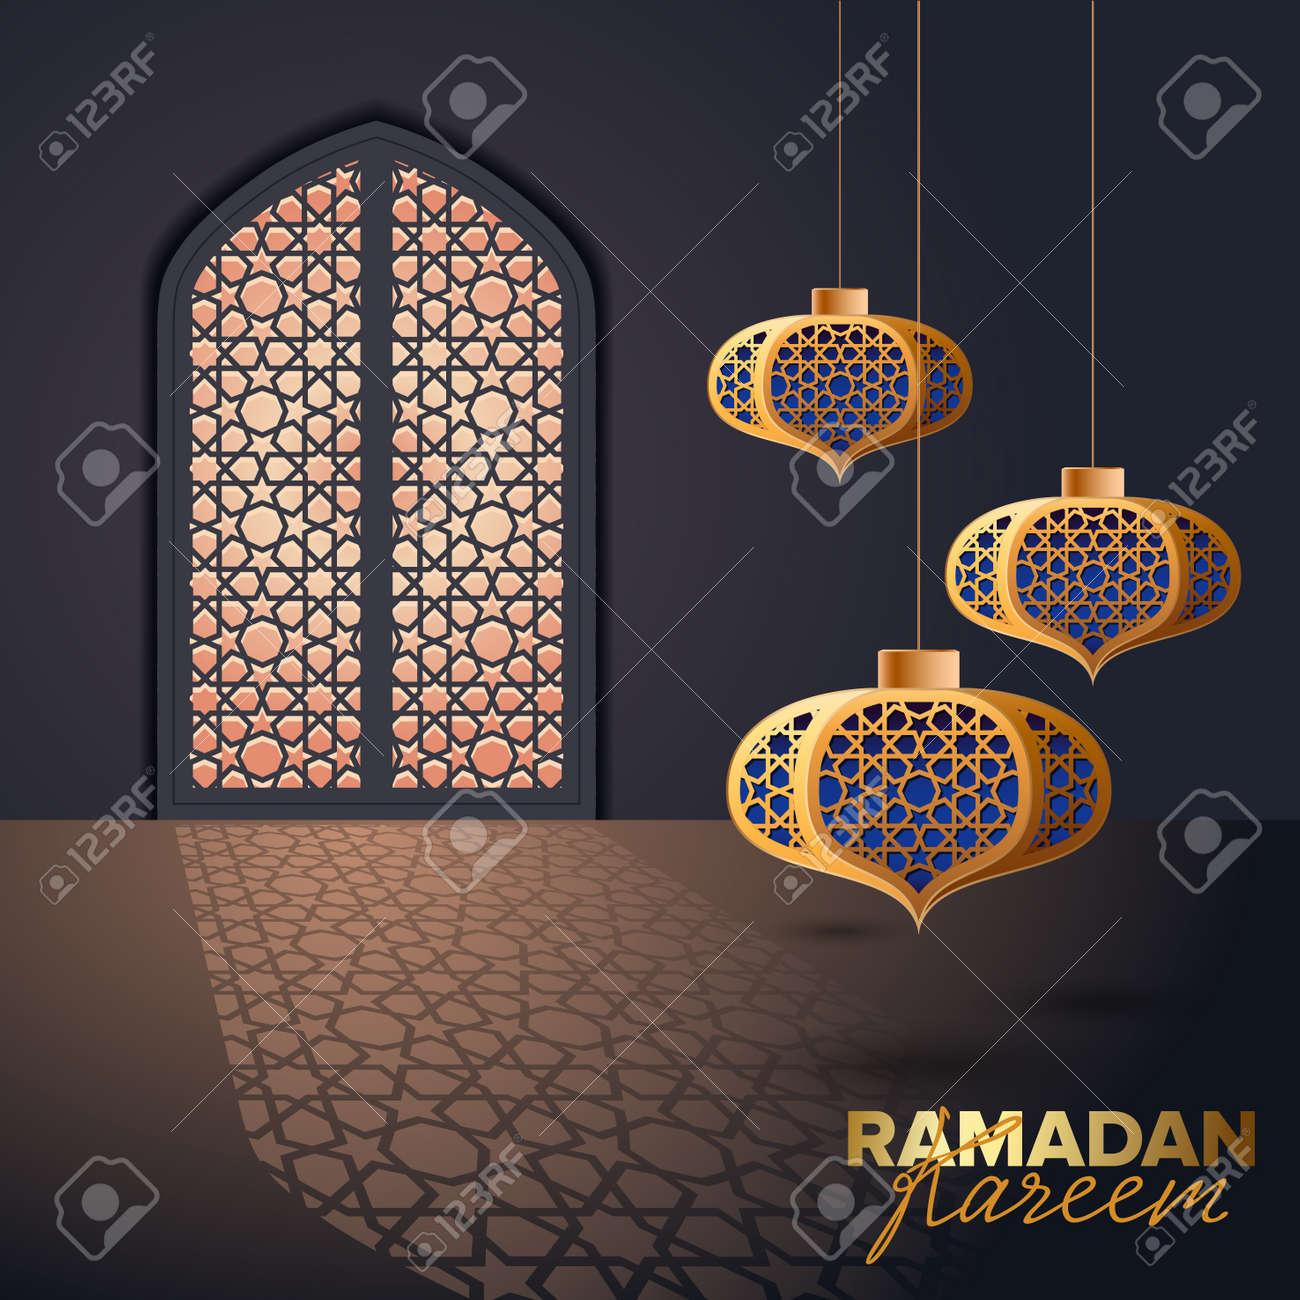 Ramadan Kareem concept banner, vector illustration. - 156322357